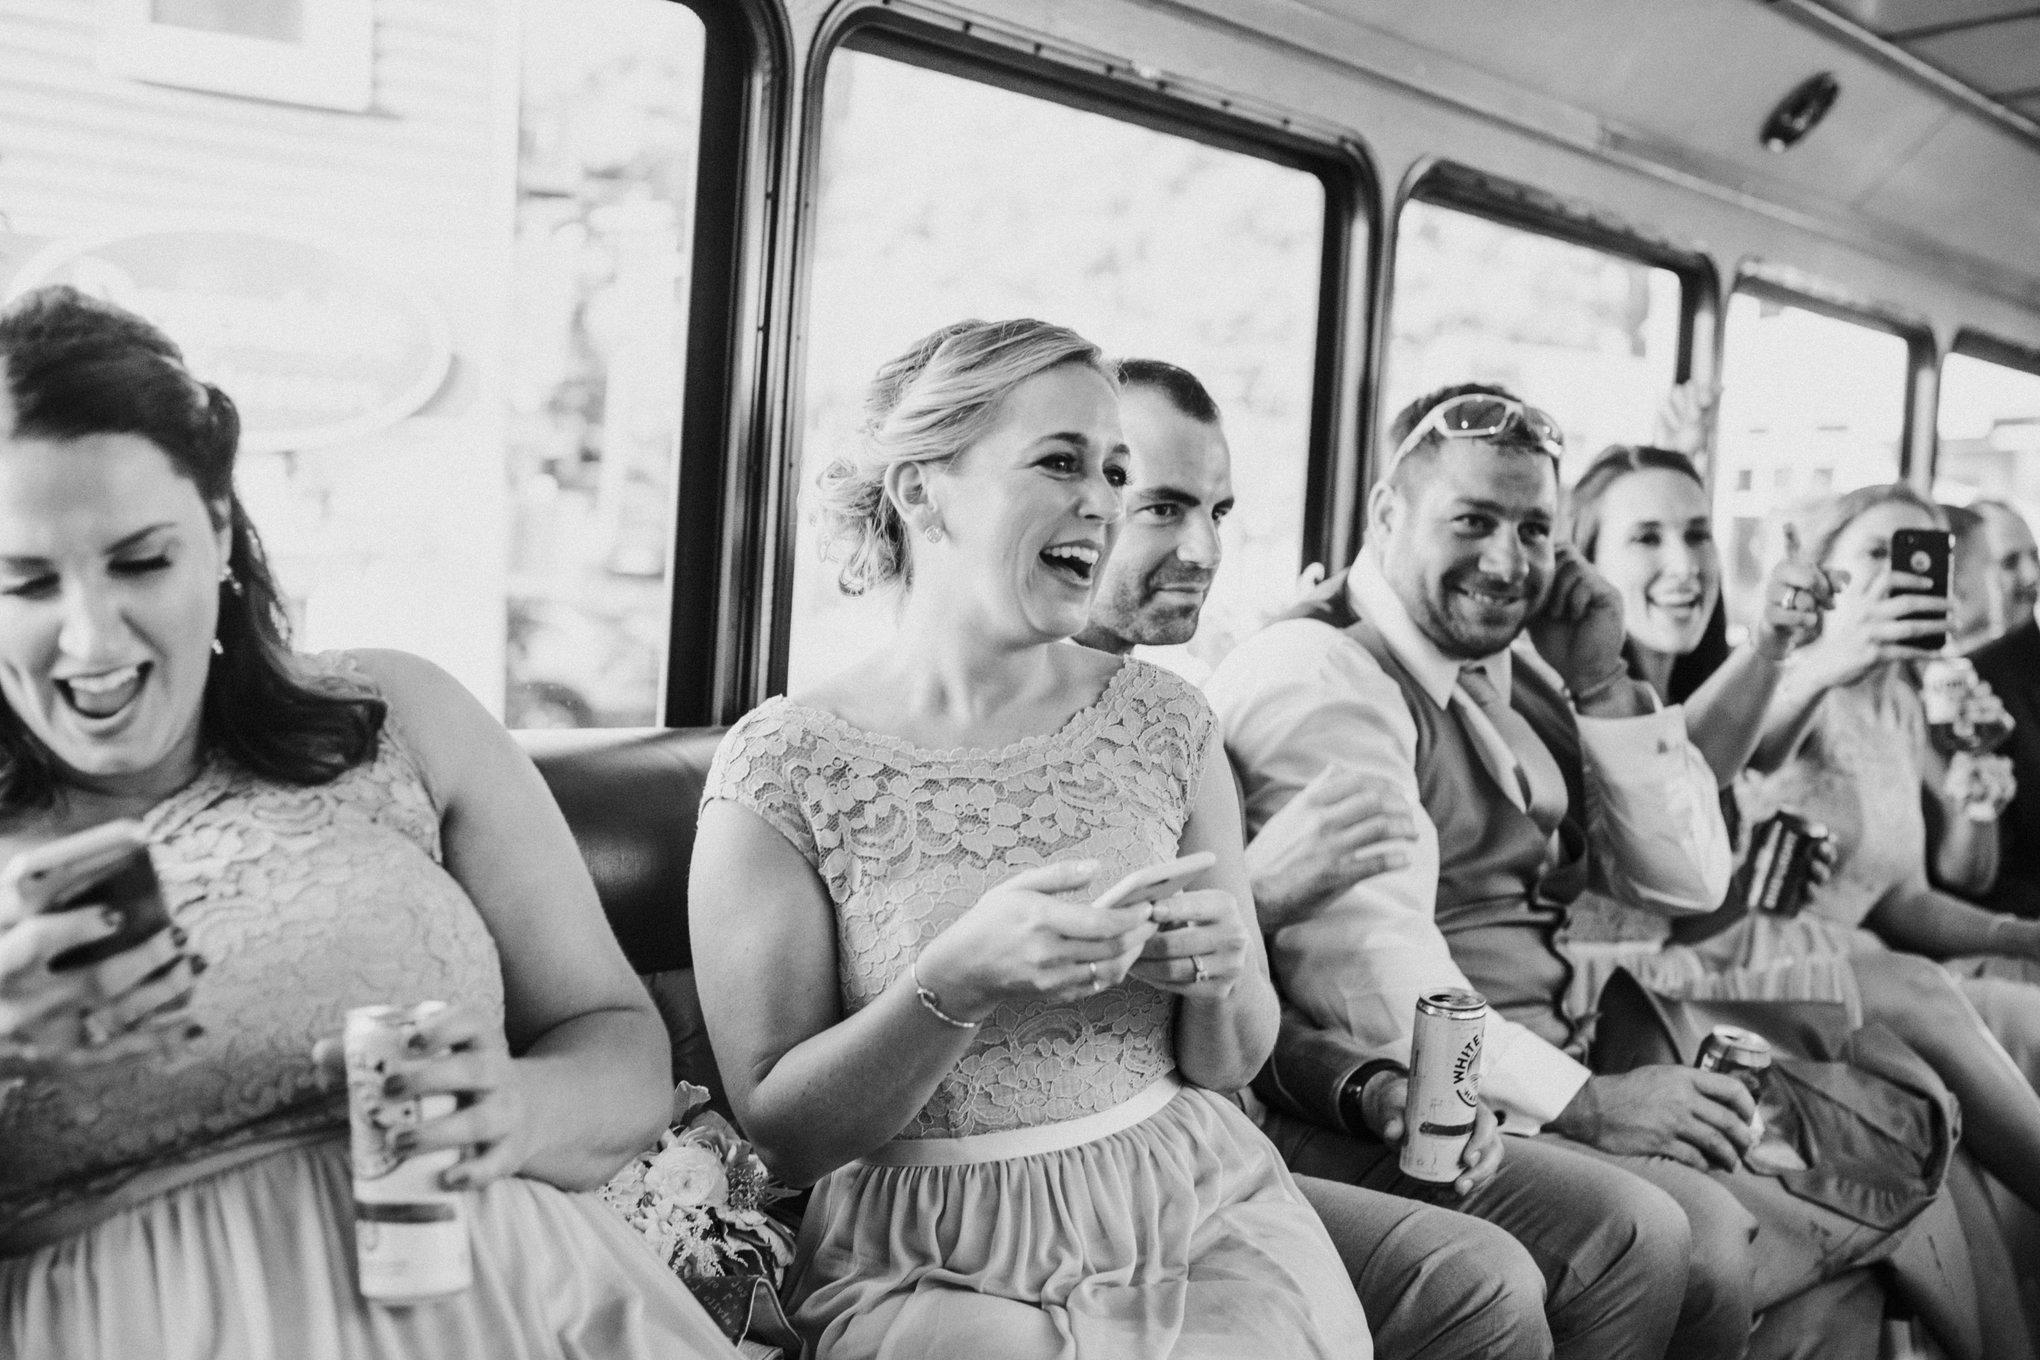 Lena_Mirisola_2017_Weddings_-037.jpg